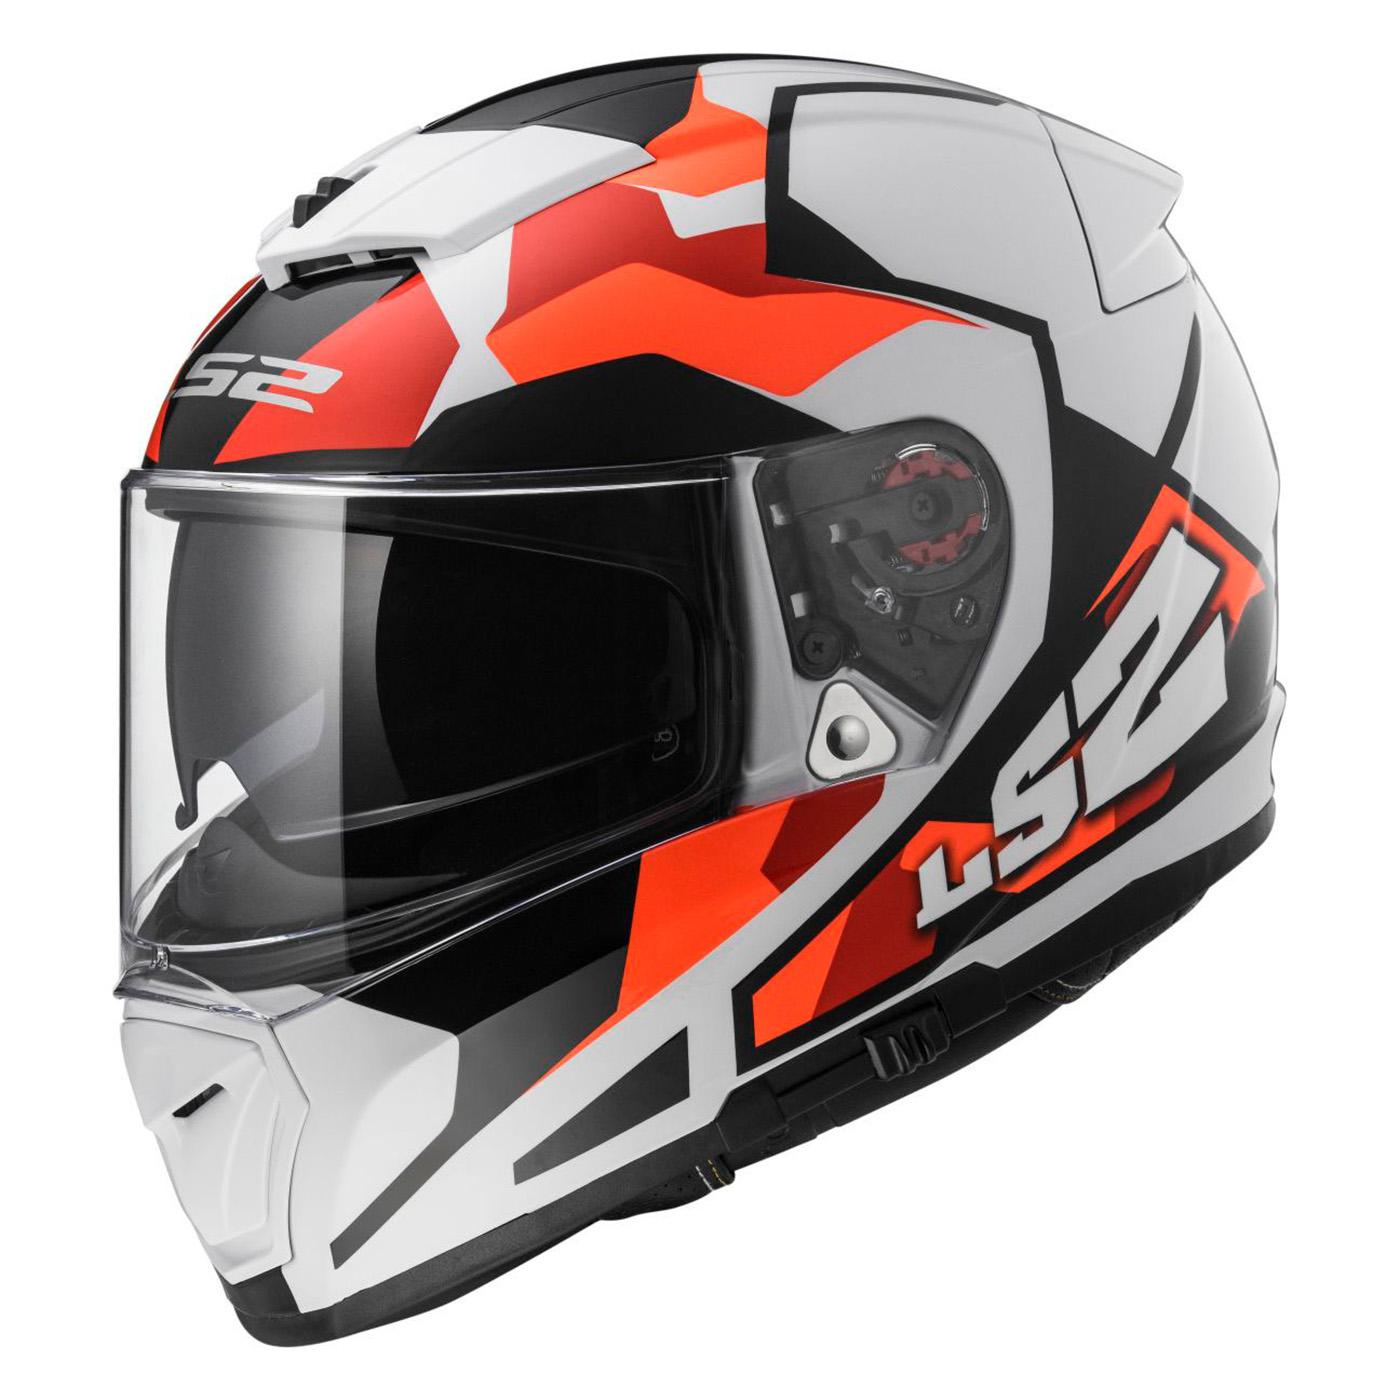 Ls2 Helmet Store Philippines Ash Cycles